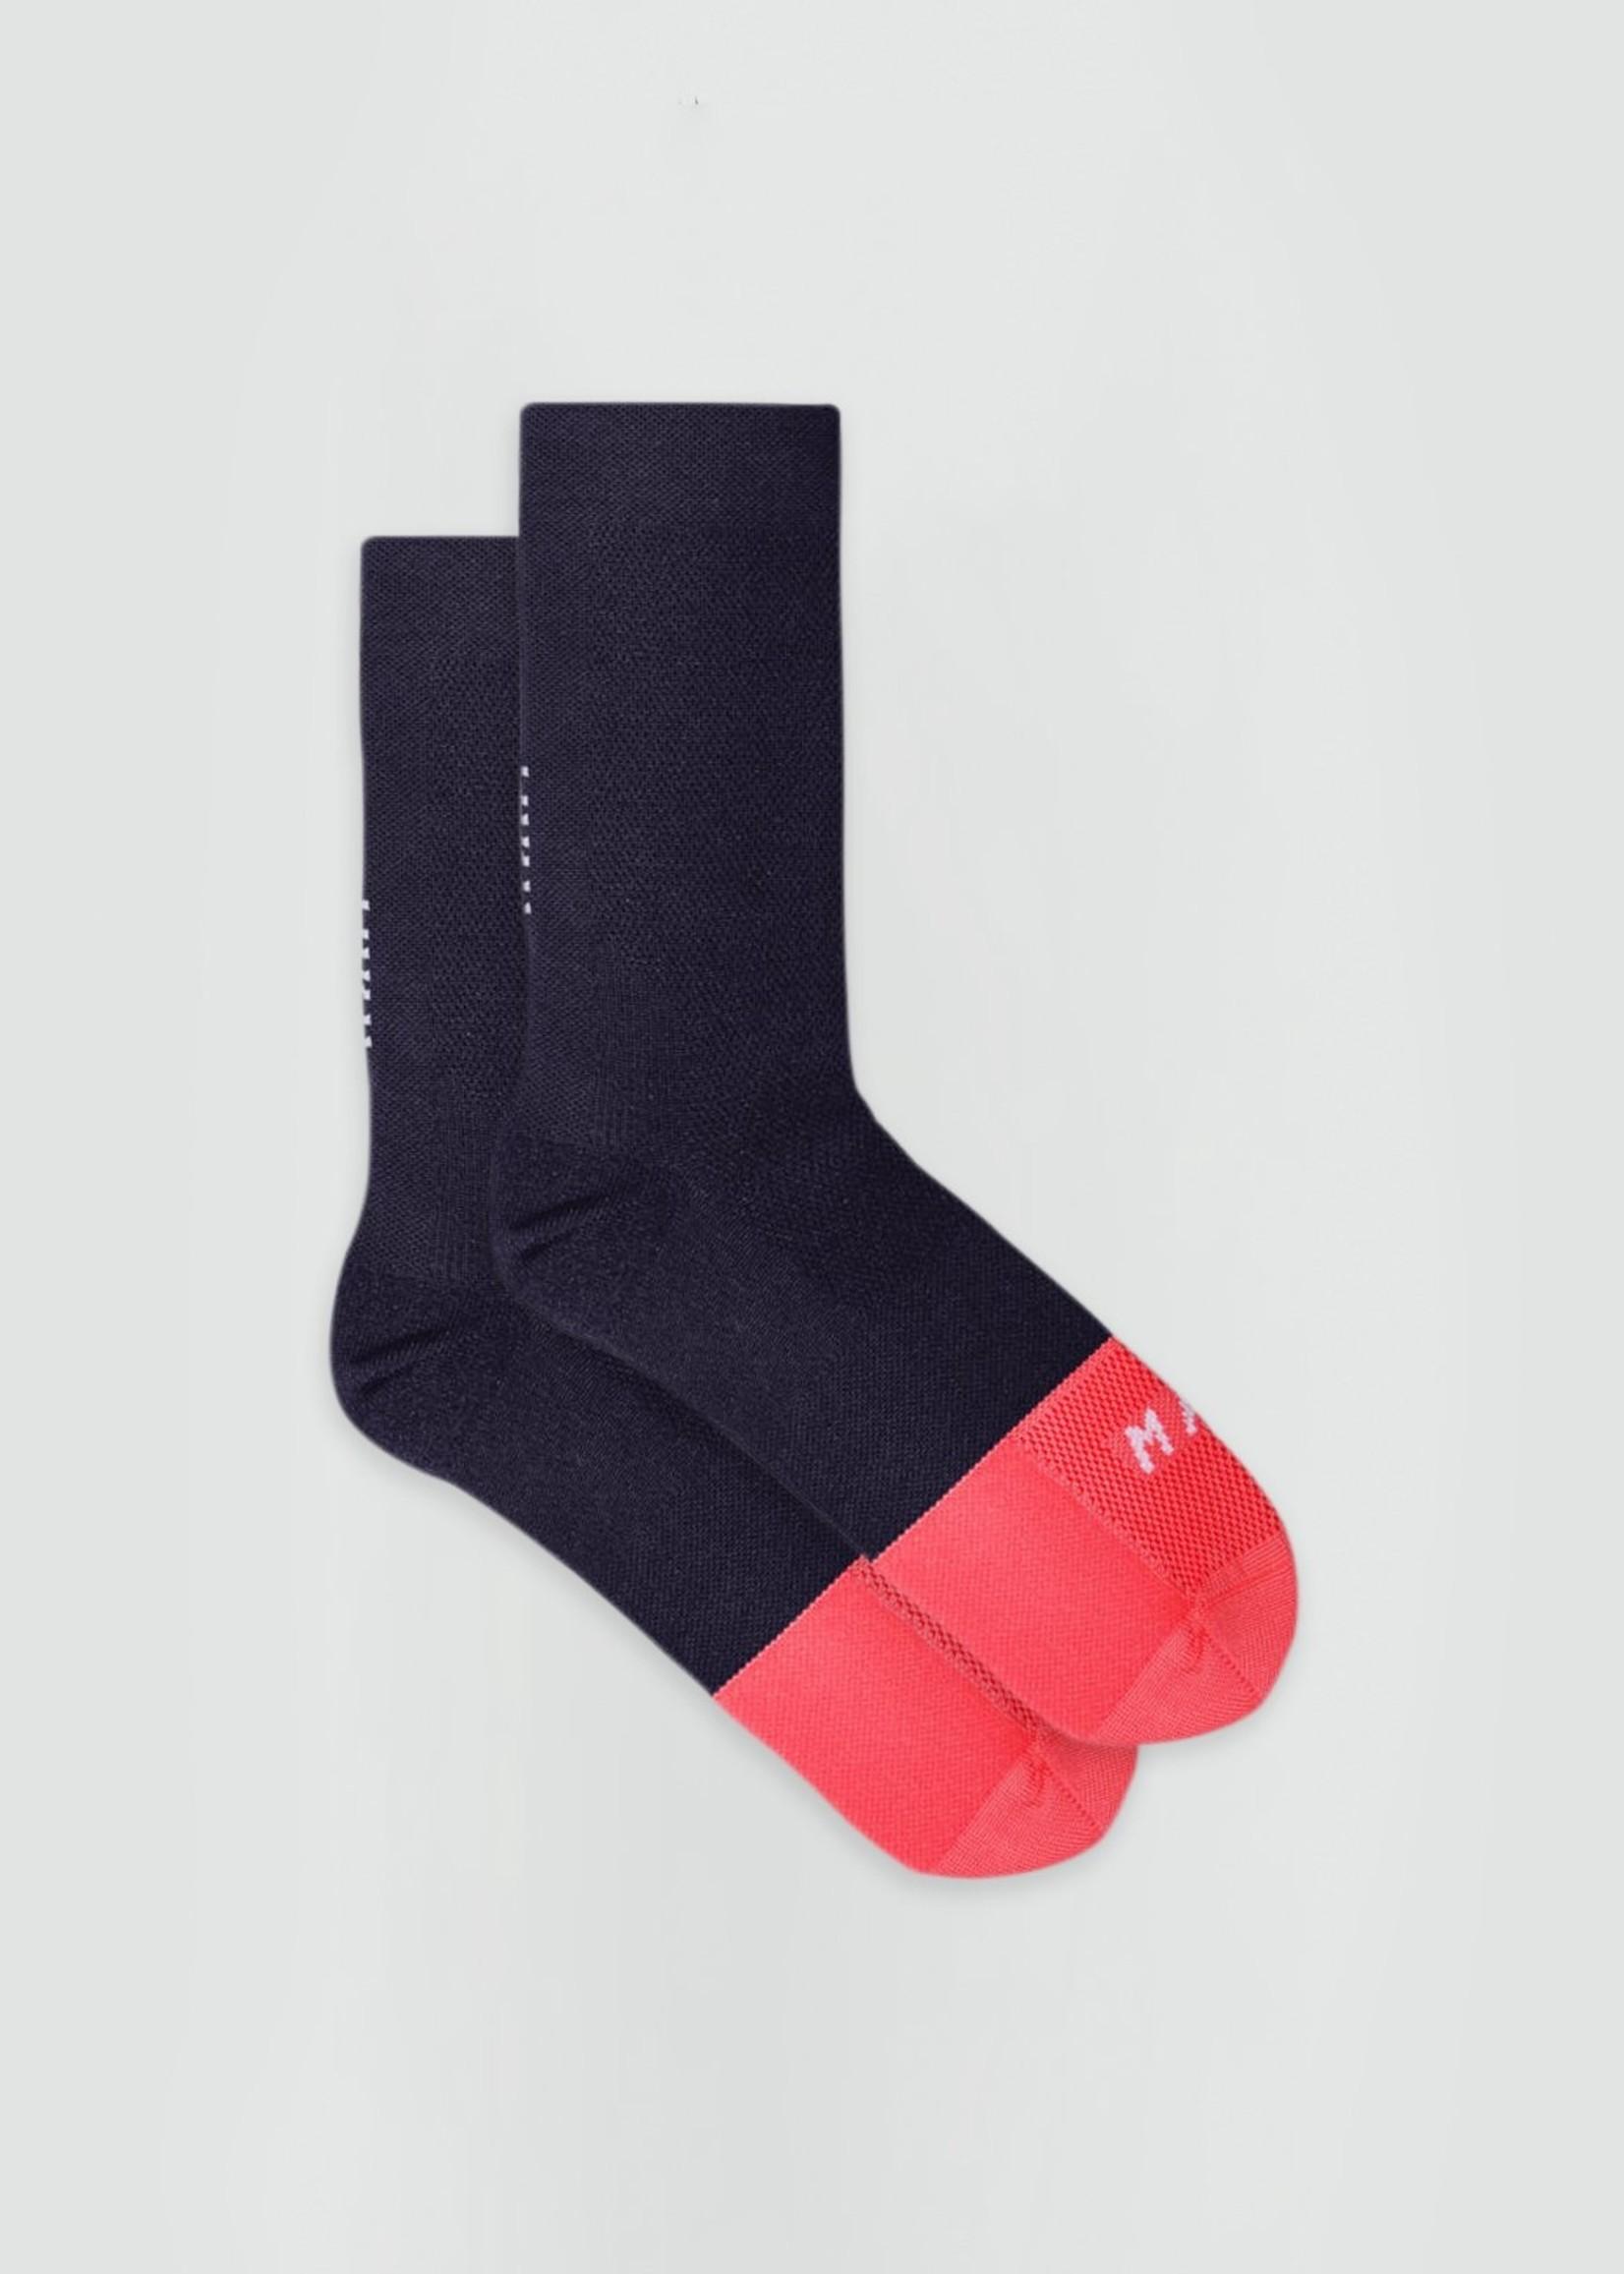 Maap Division Sock - Navy